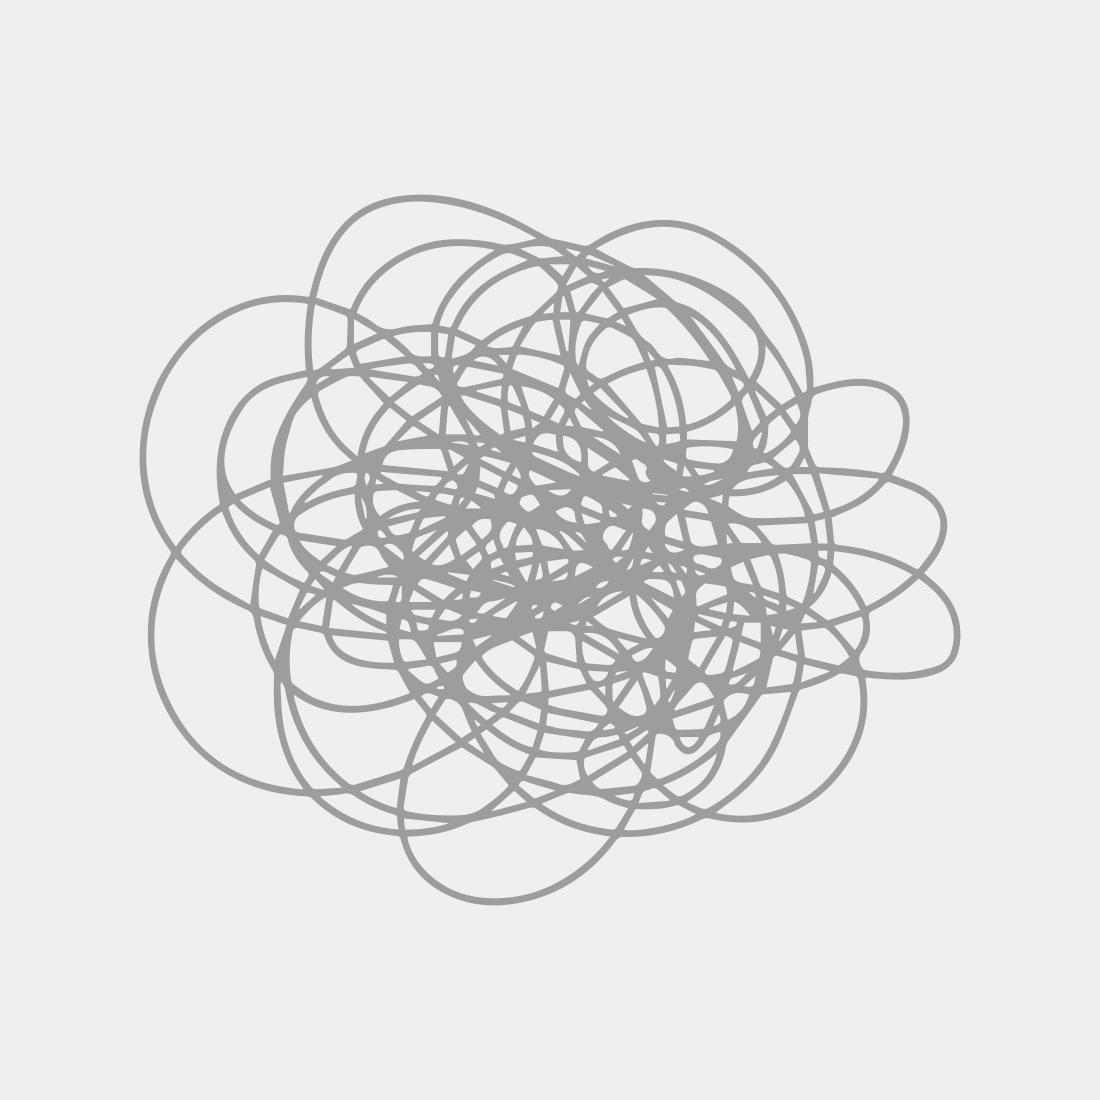 Royal Academy Christmas Cards 2018